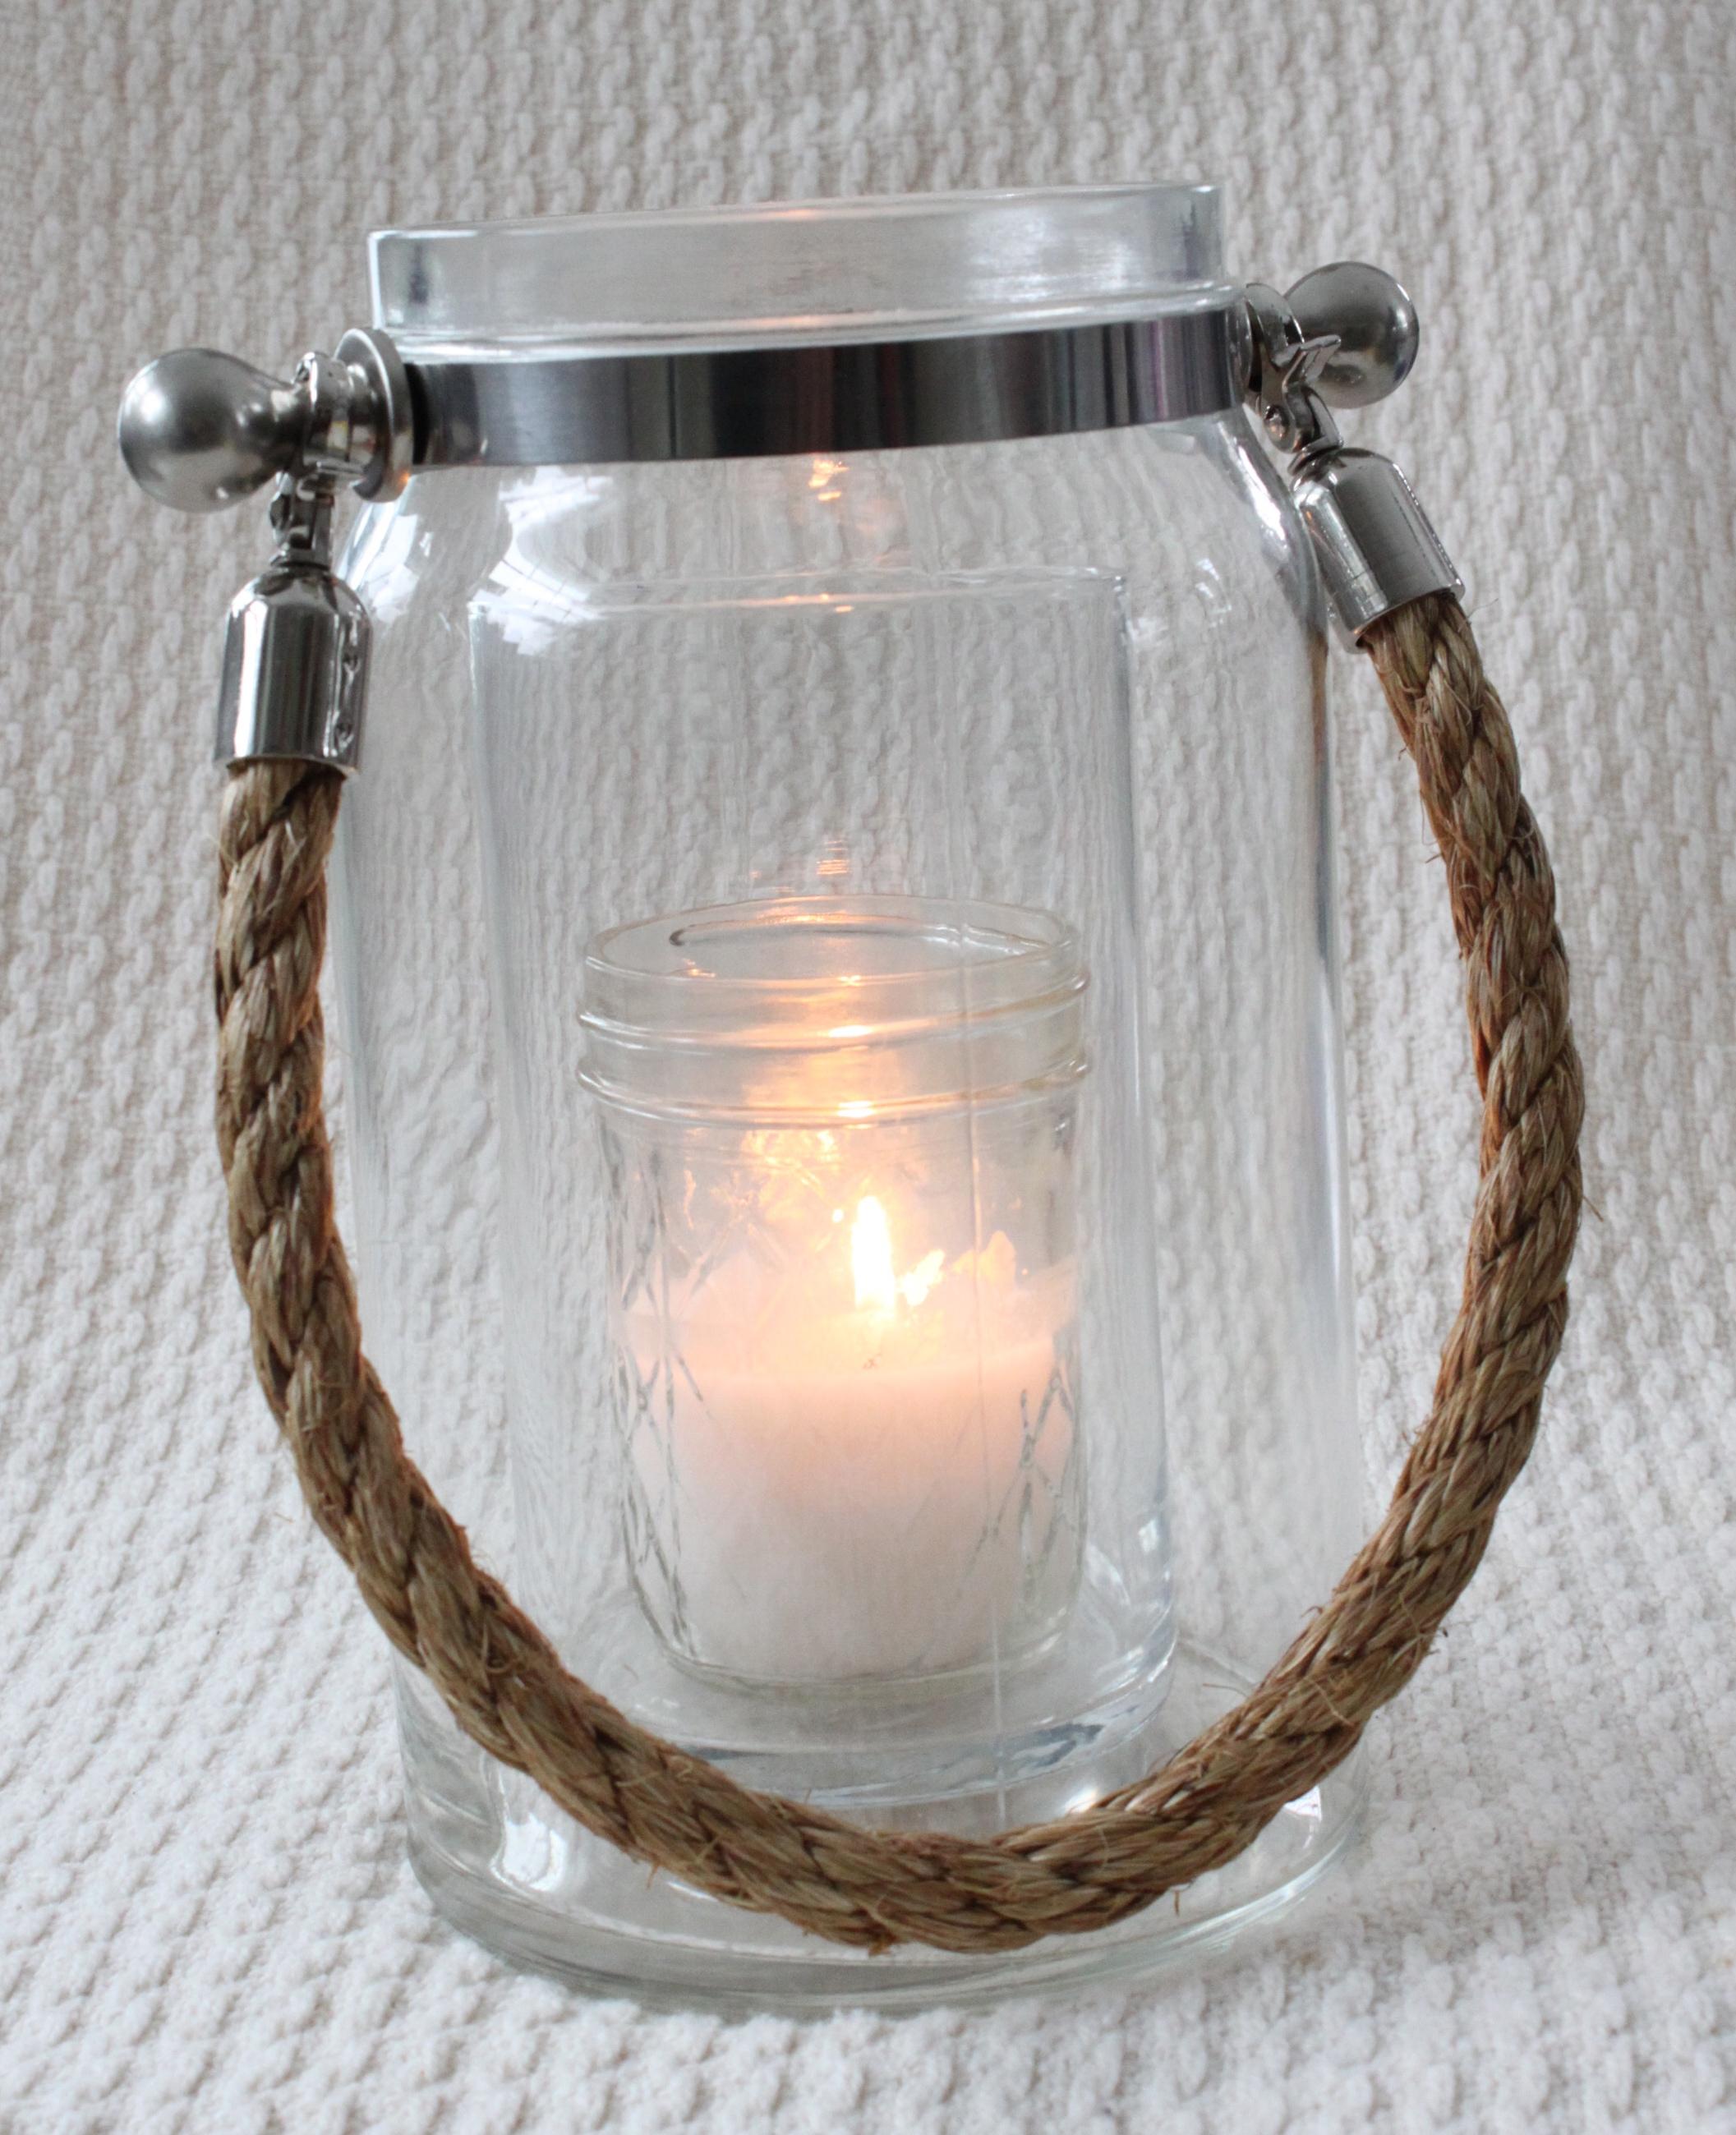 Rope handled lantern-large  $15 each